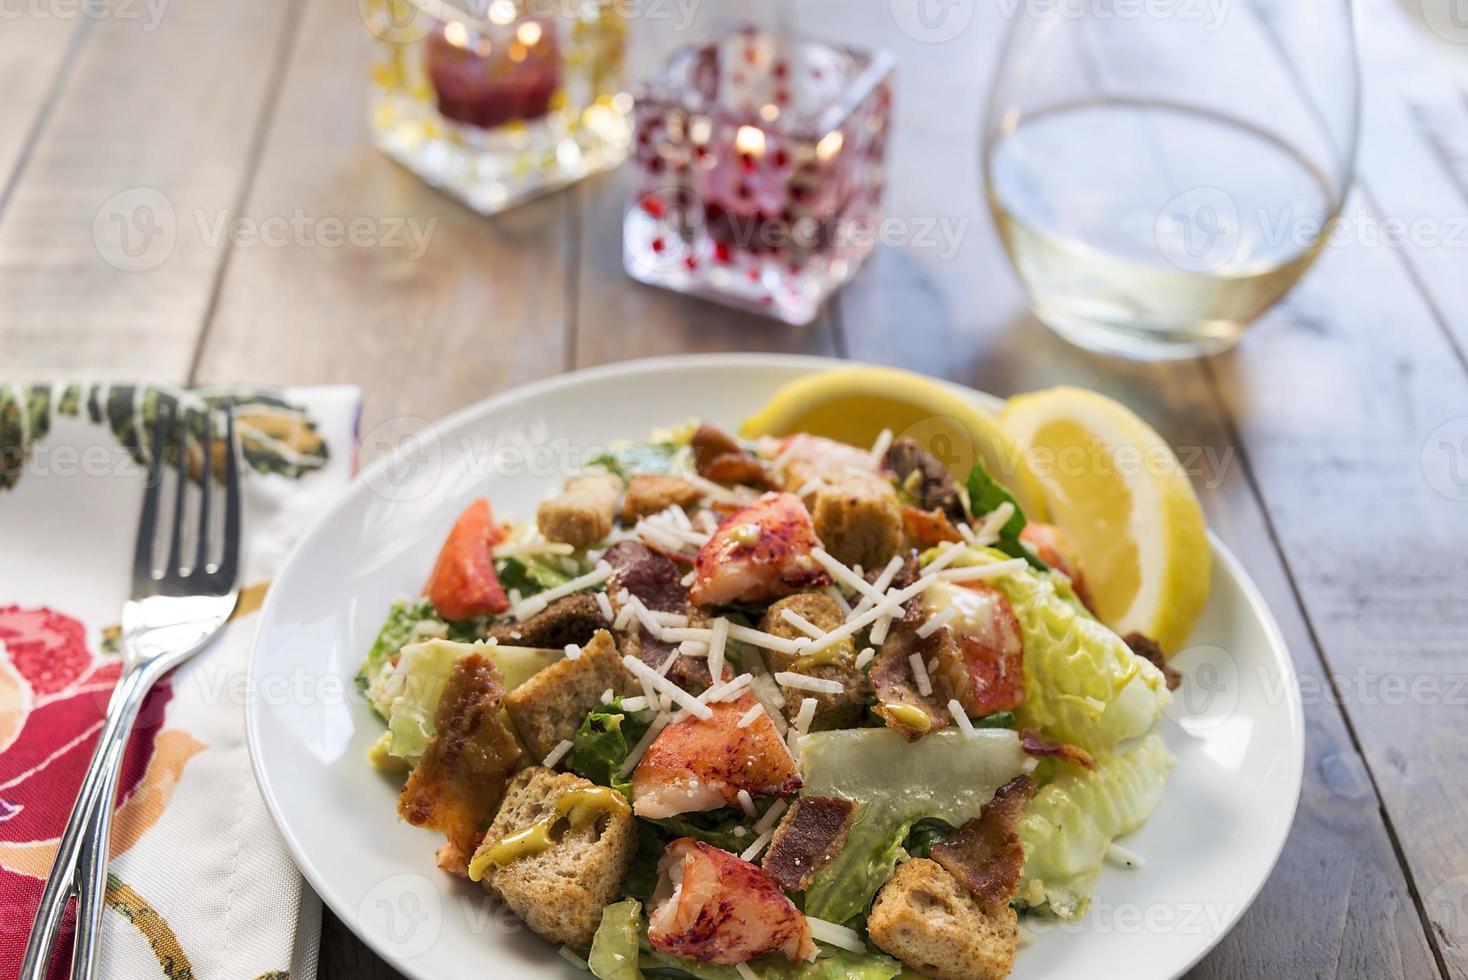 Lobster Caesar salad photo